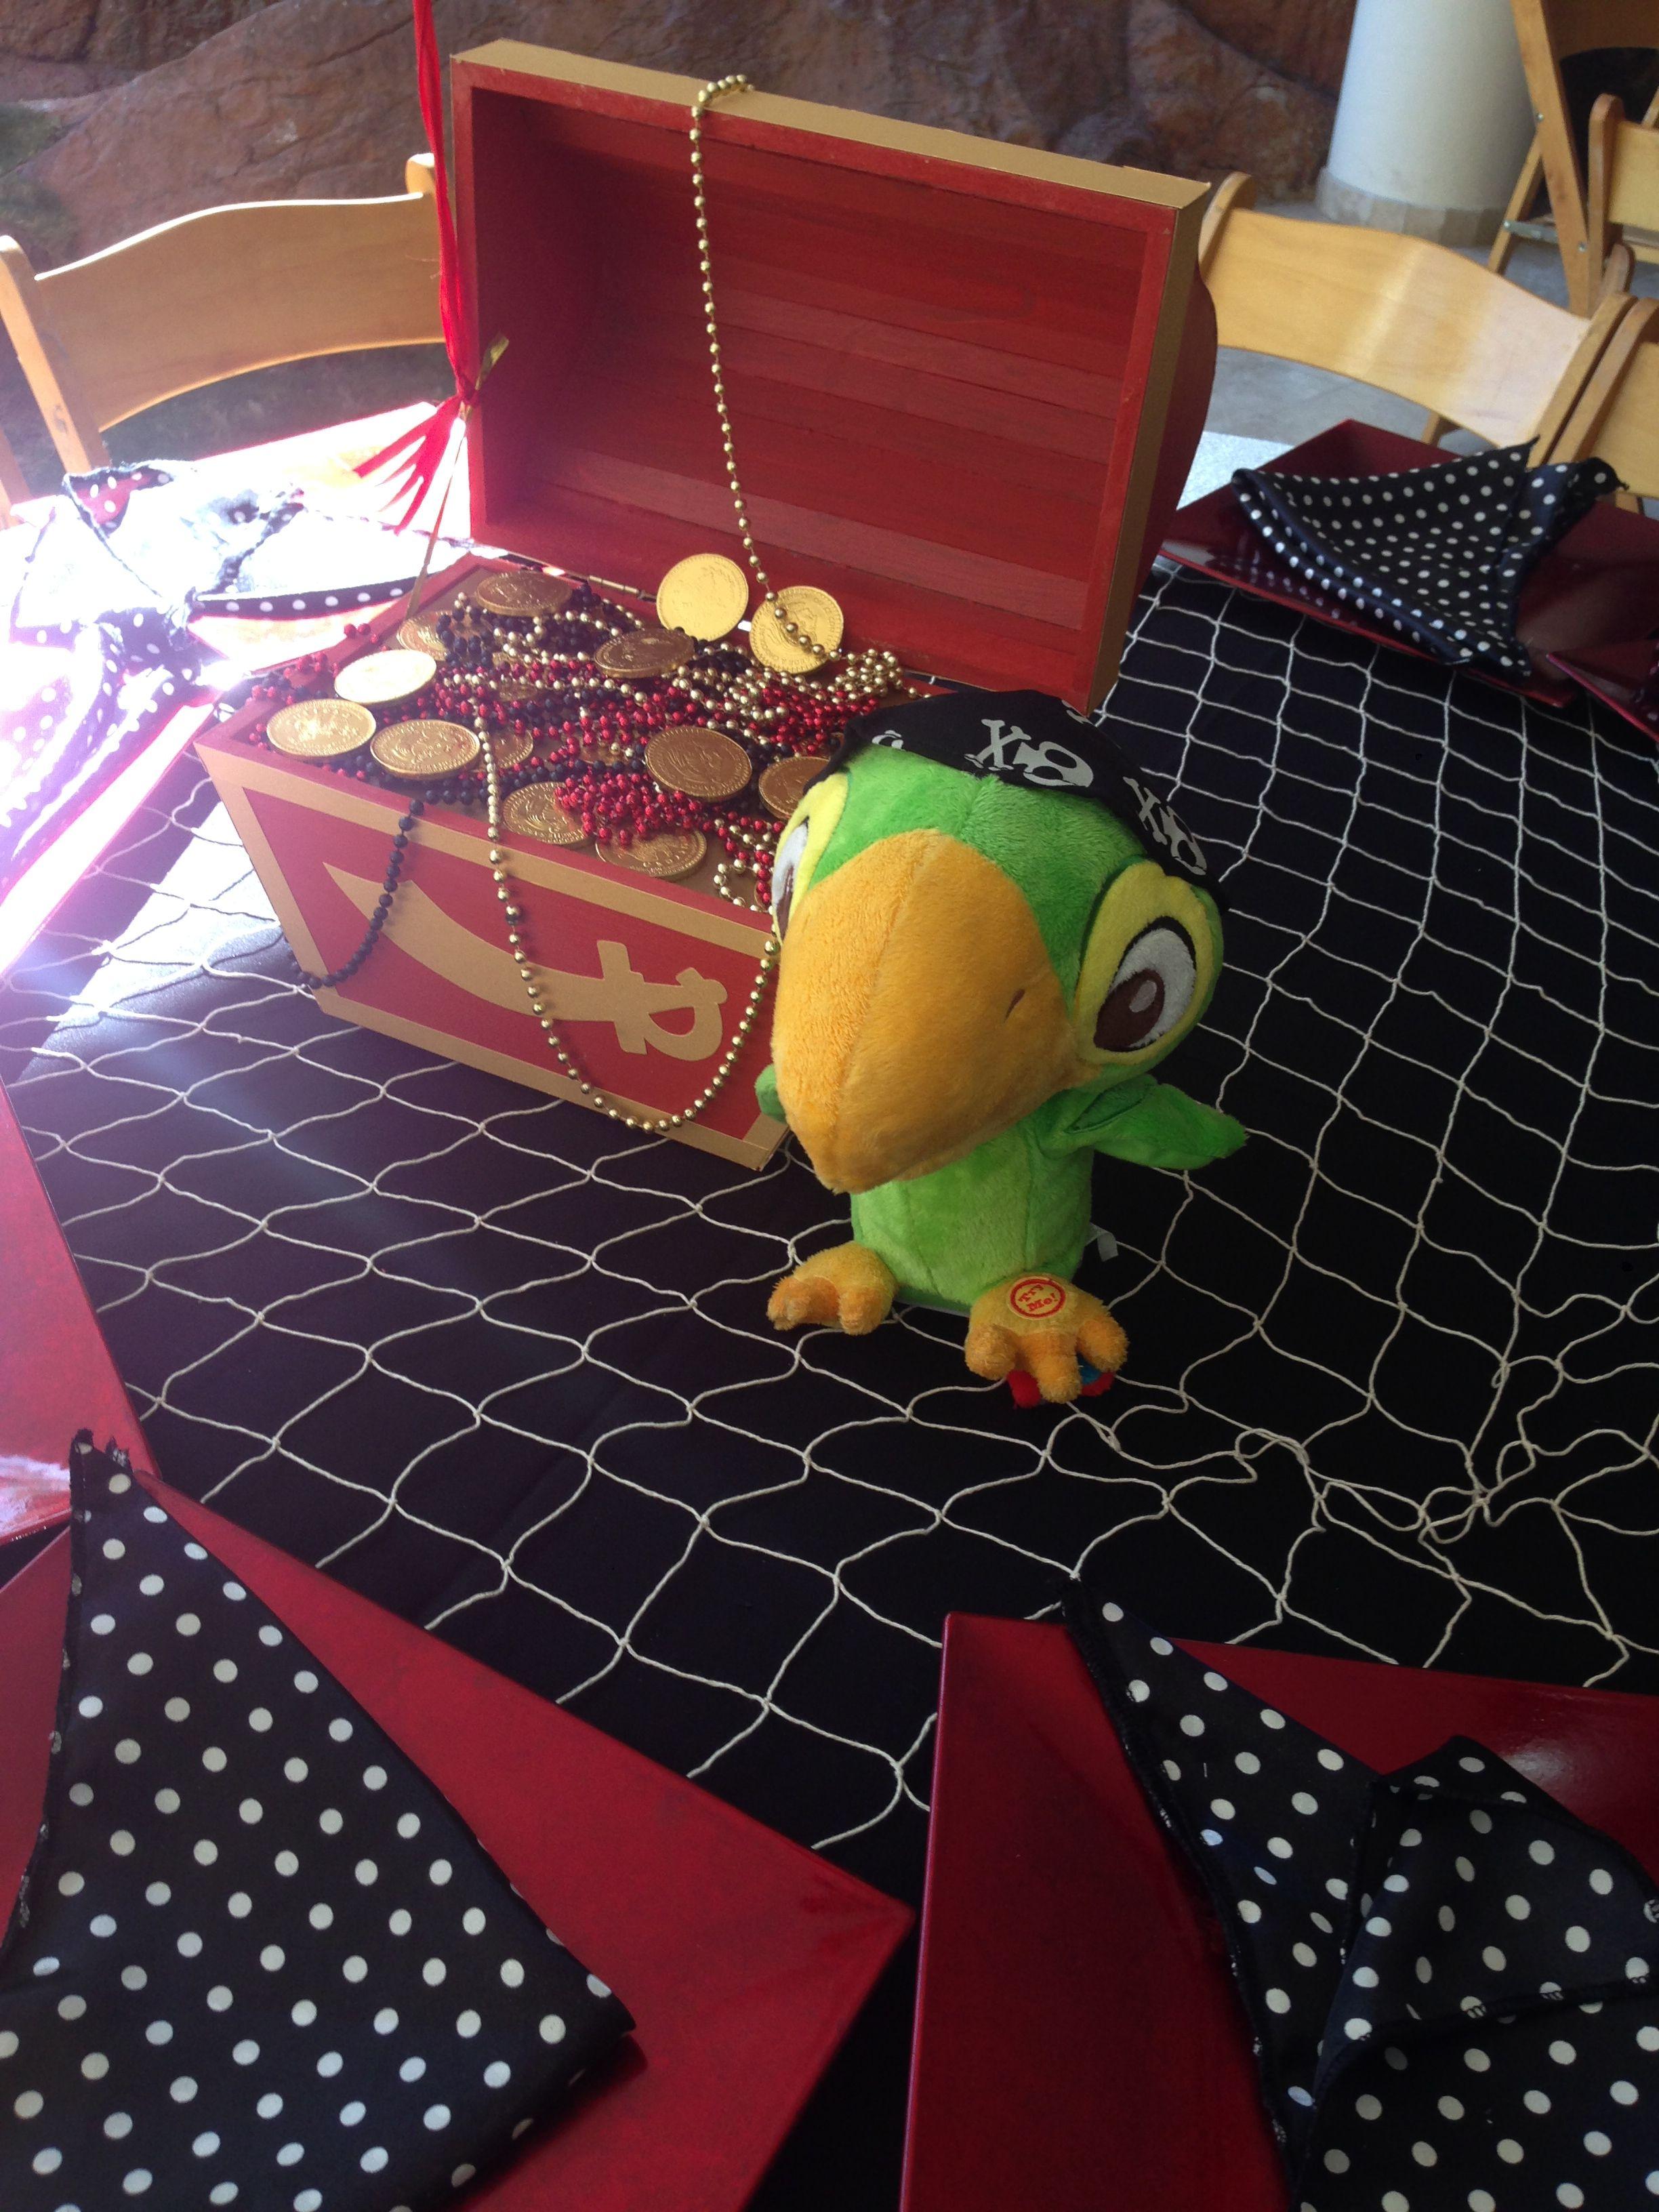 Jake and the Neverland pirates treasure chest